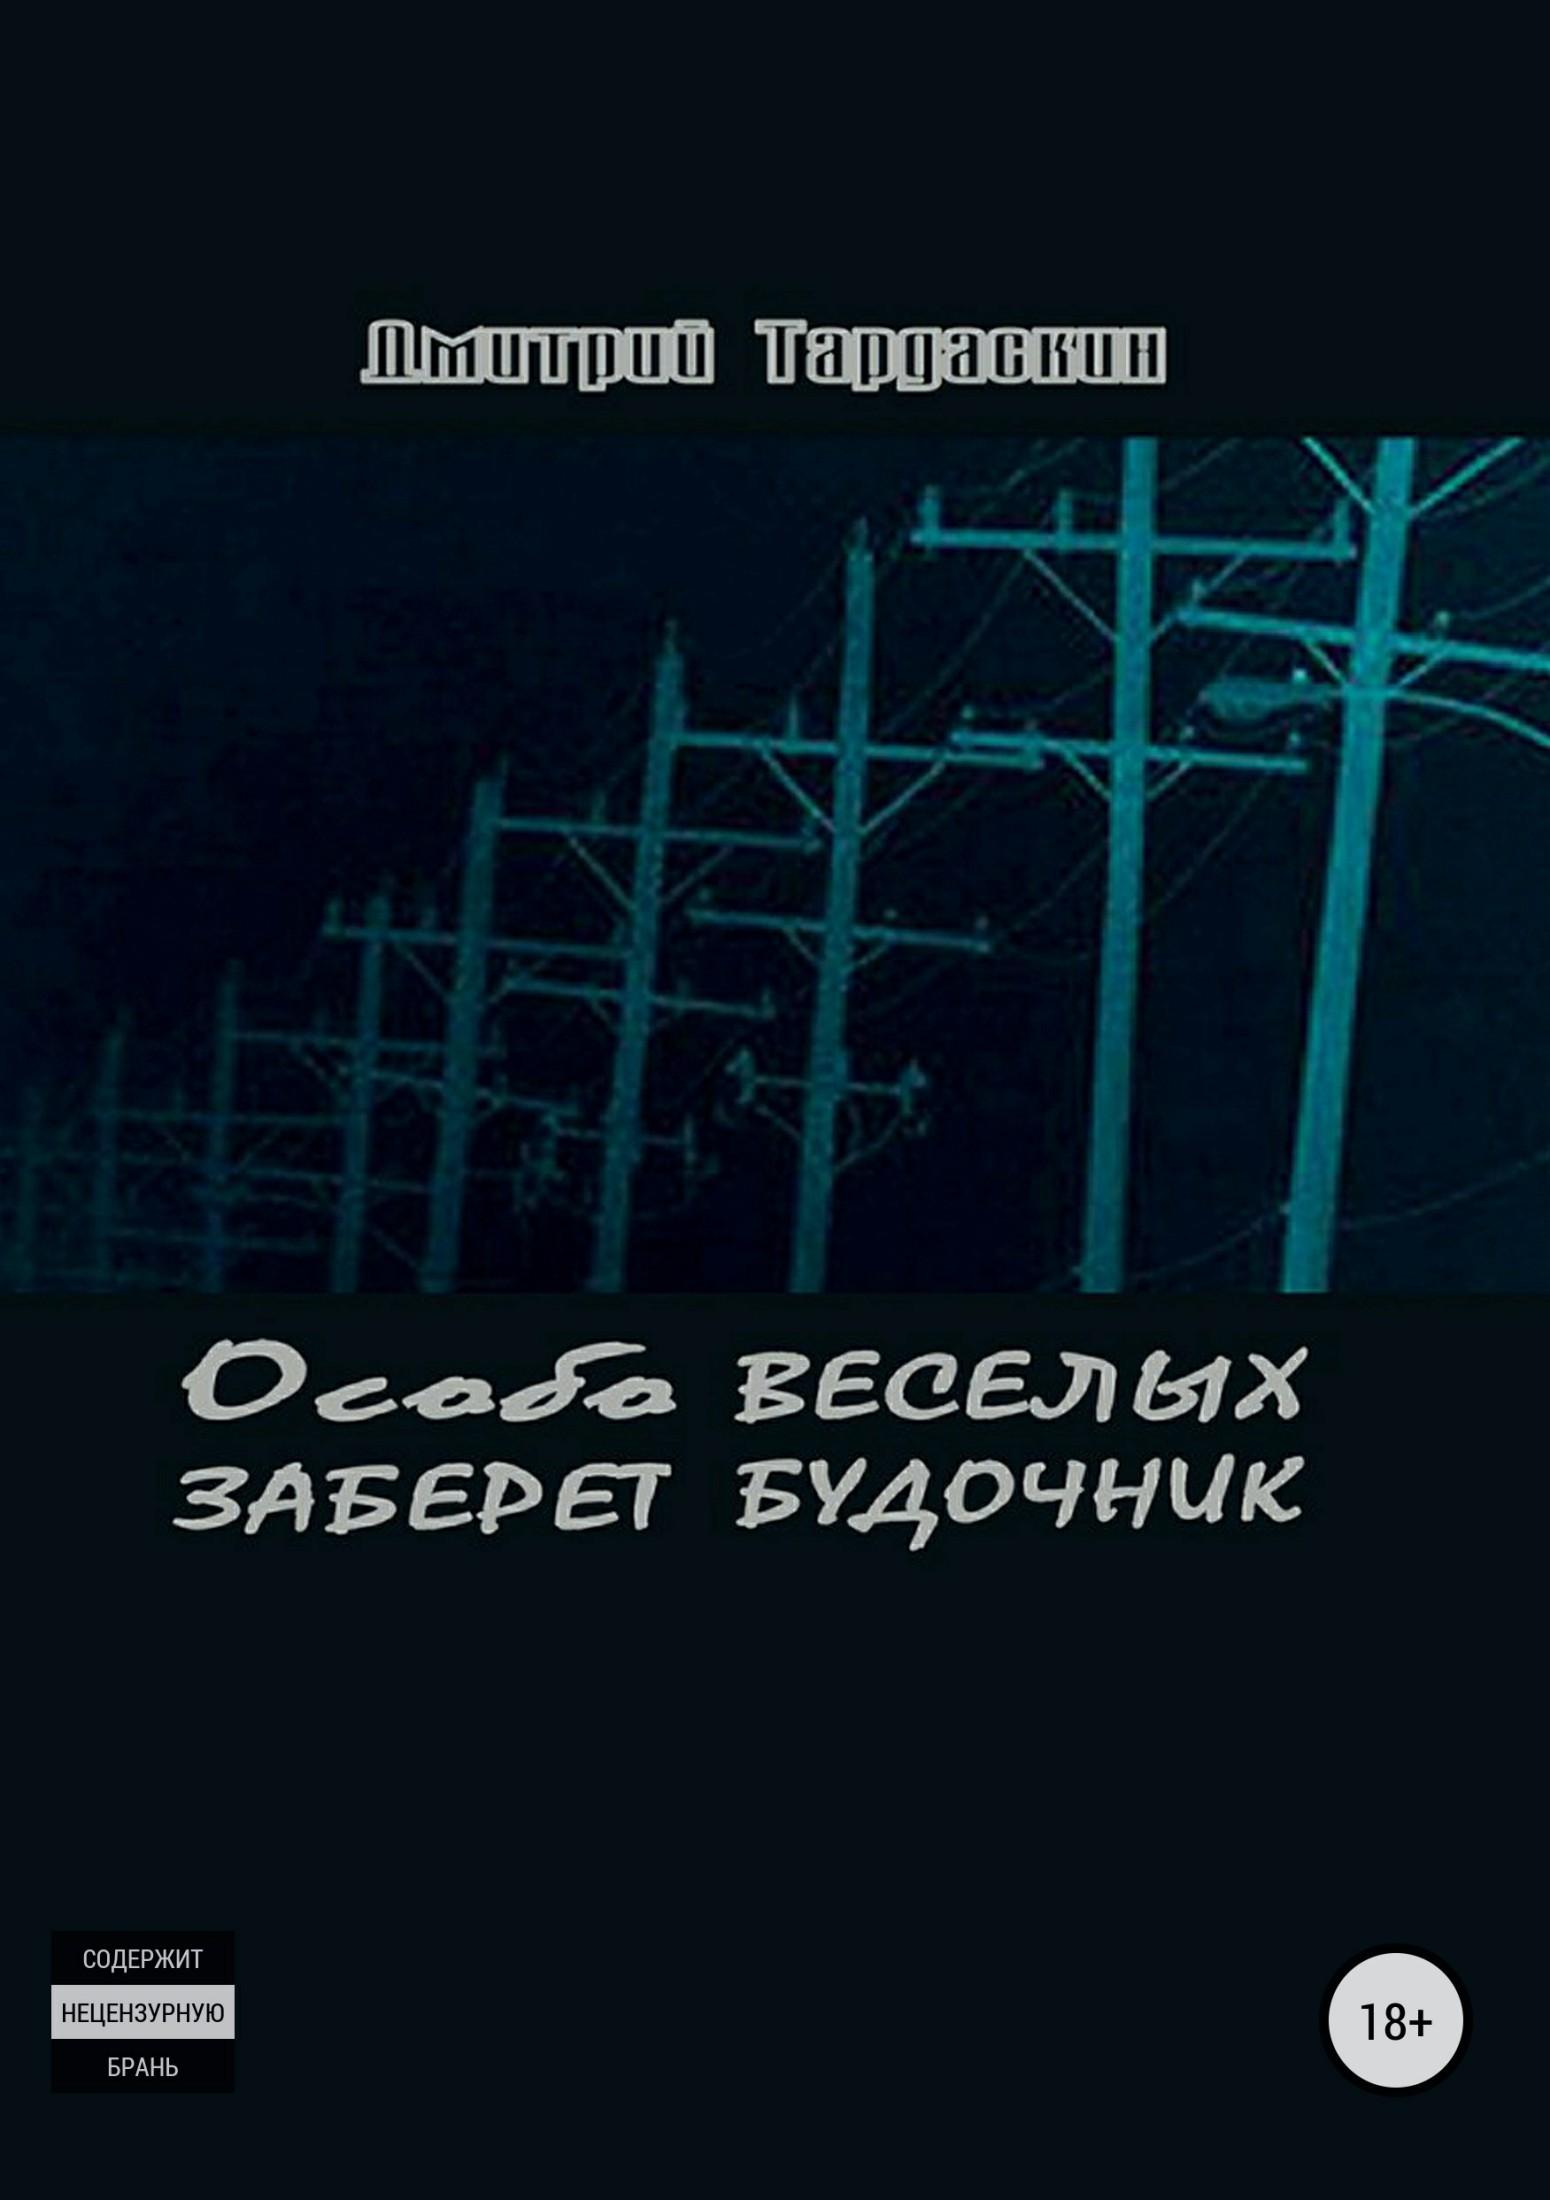 Дмитрий Александрович Тардаскин. Особо веселых заберет будочник